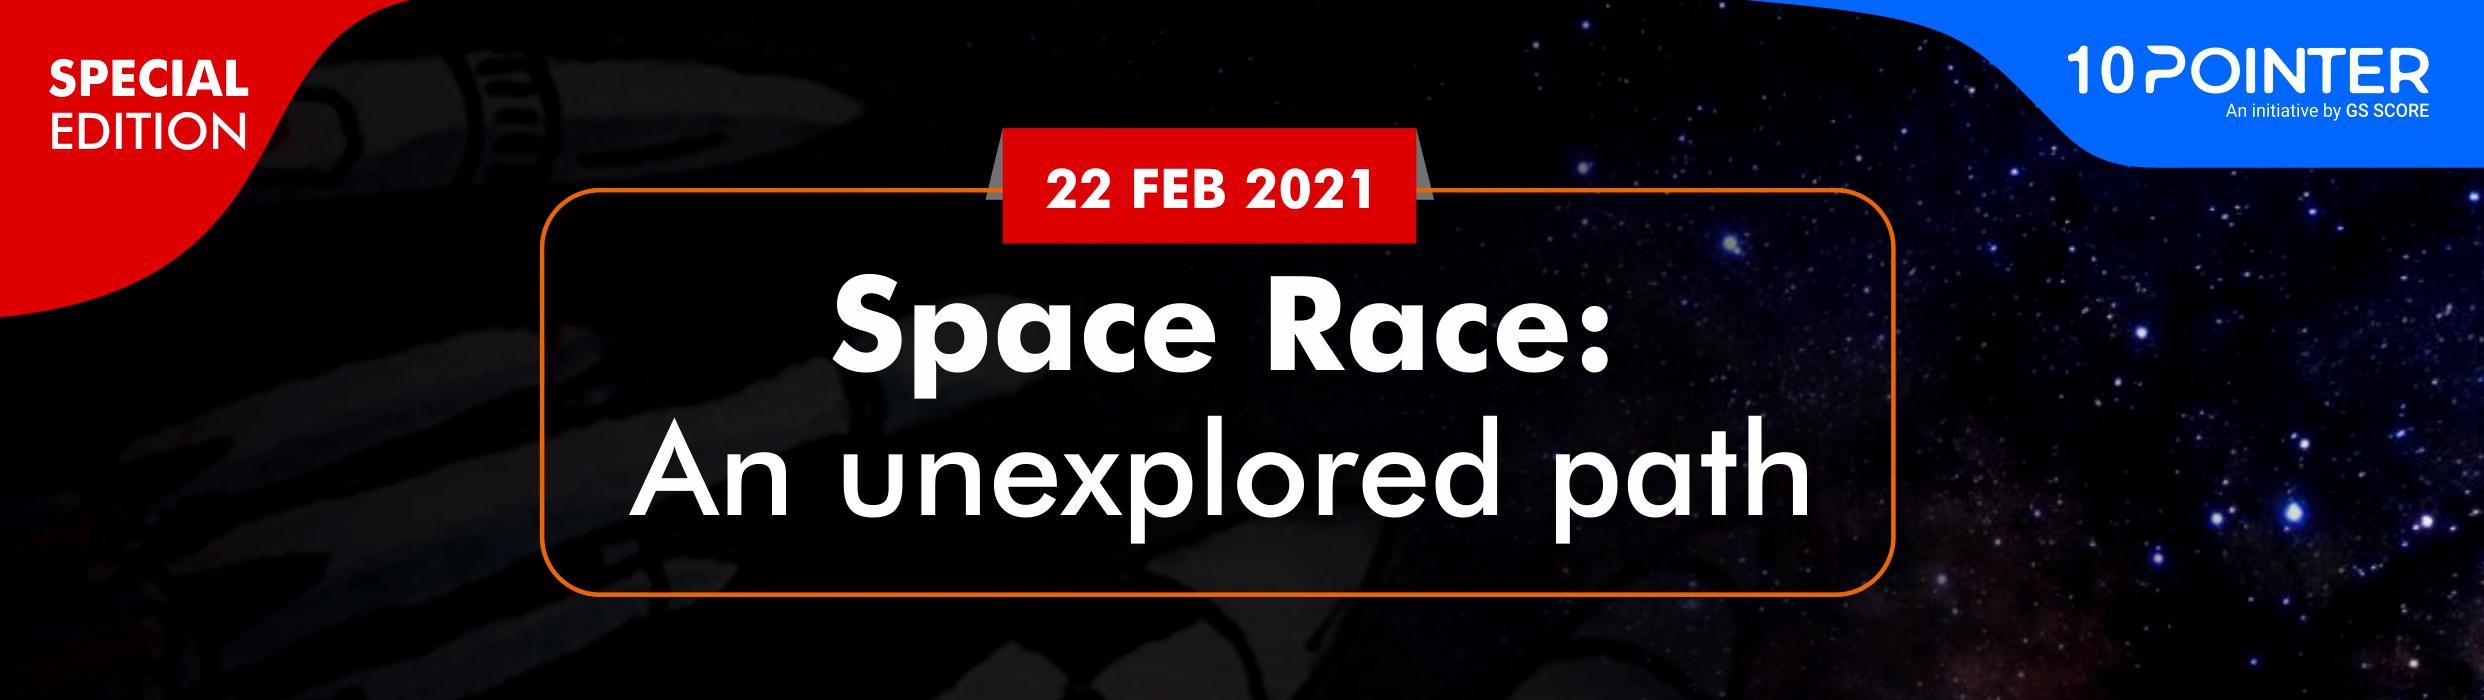 Space Race: an unexplored path